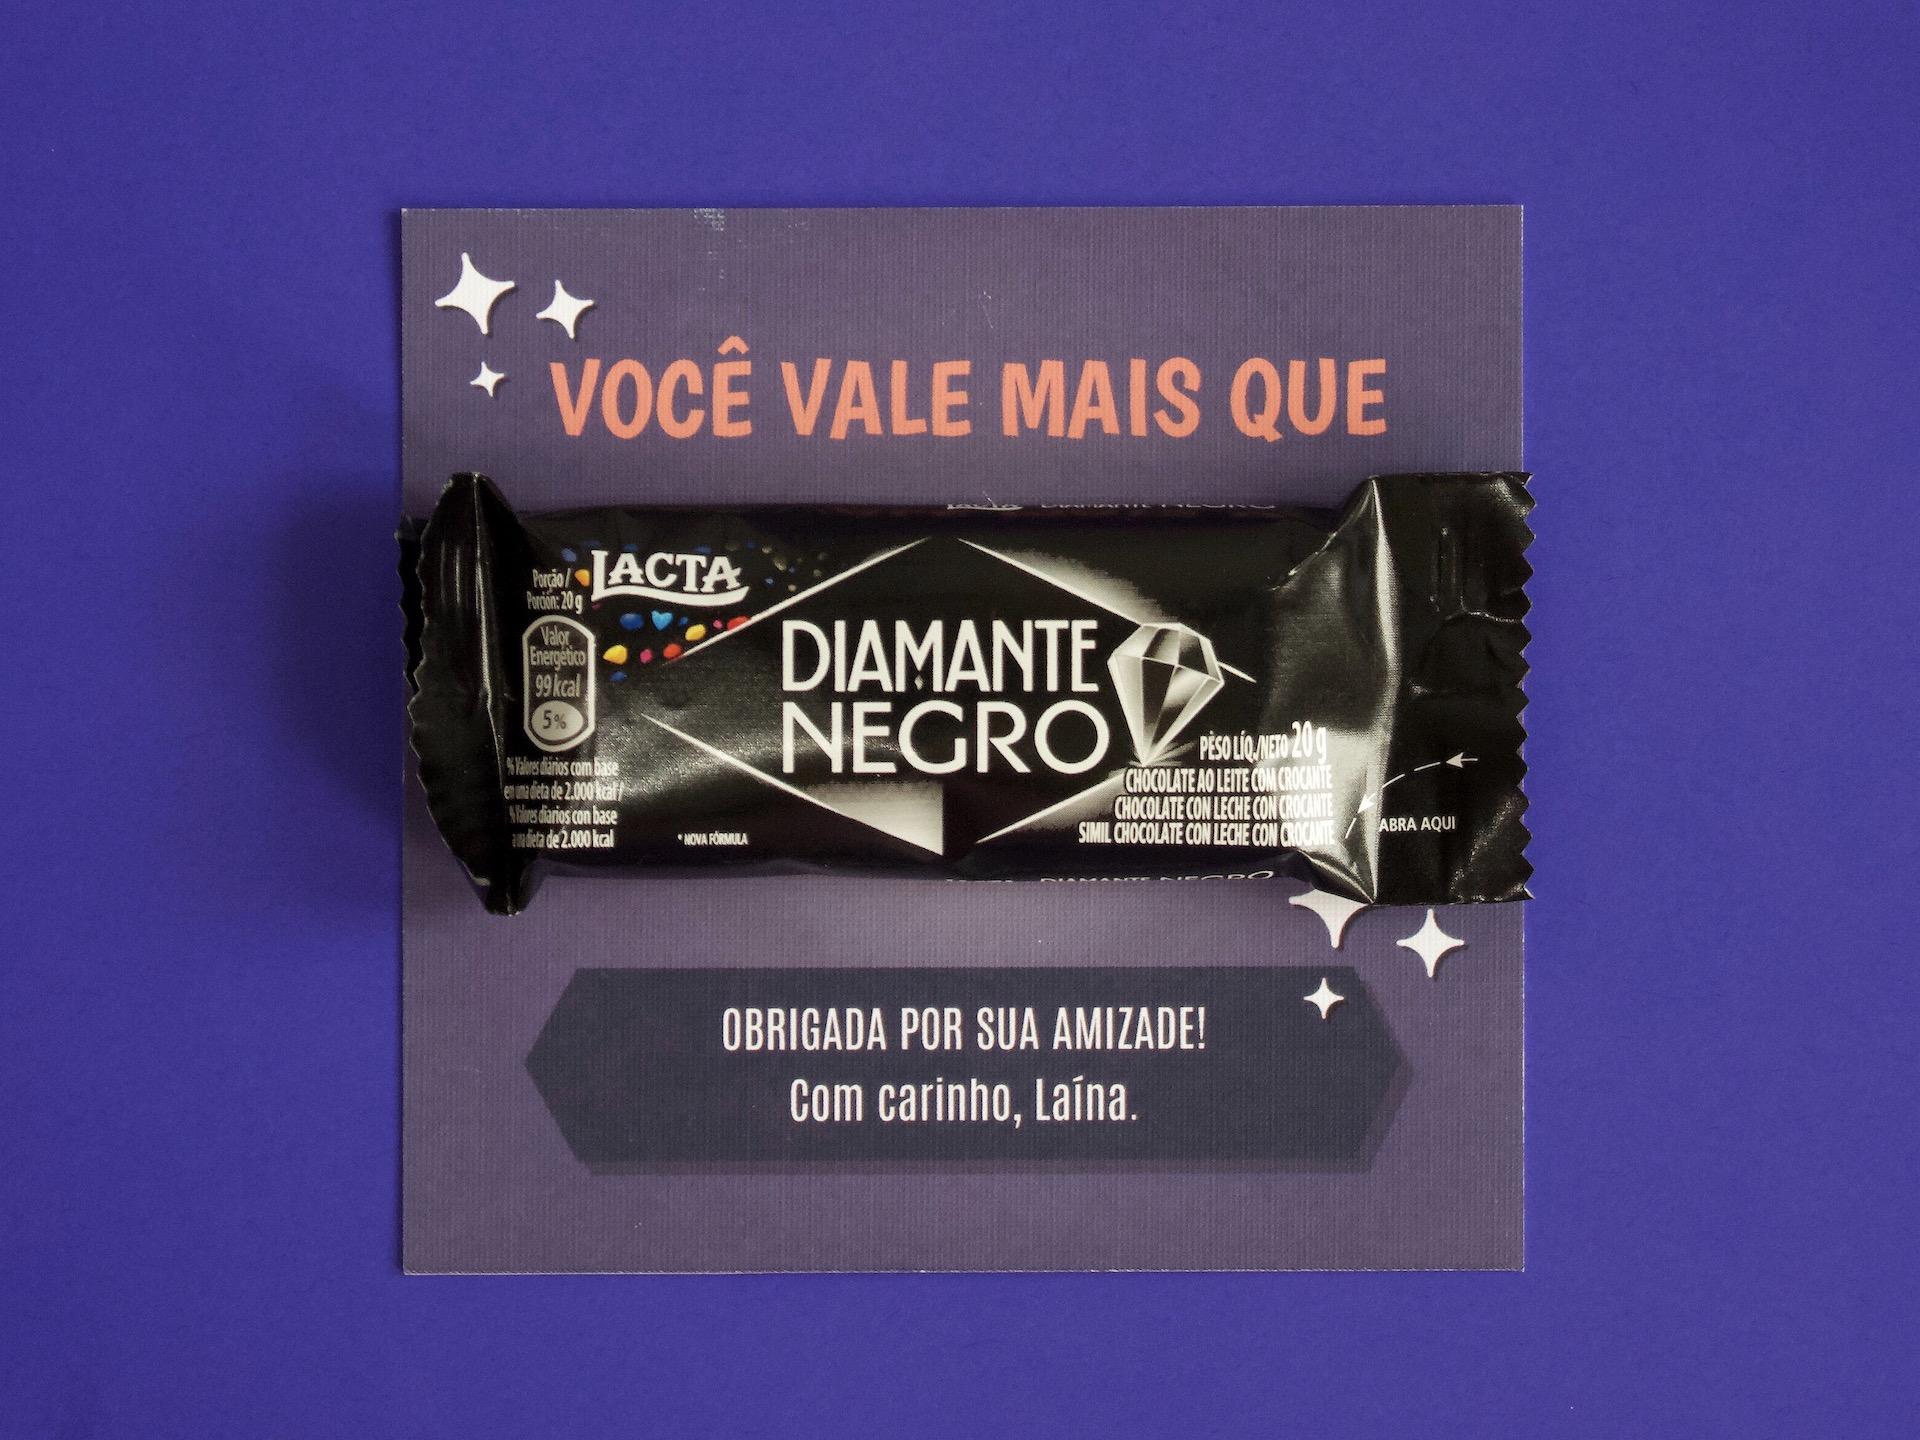 diamante negro ideia de frase para imprimir